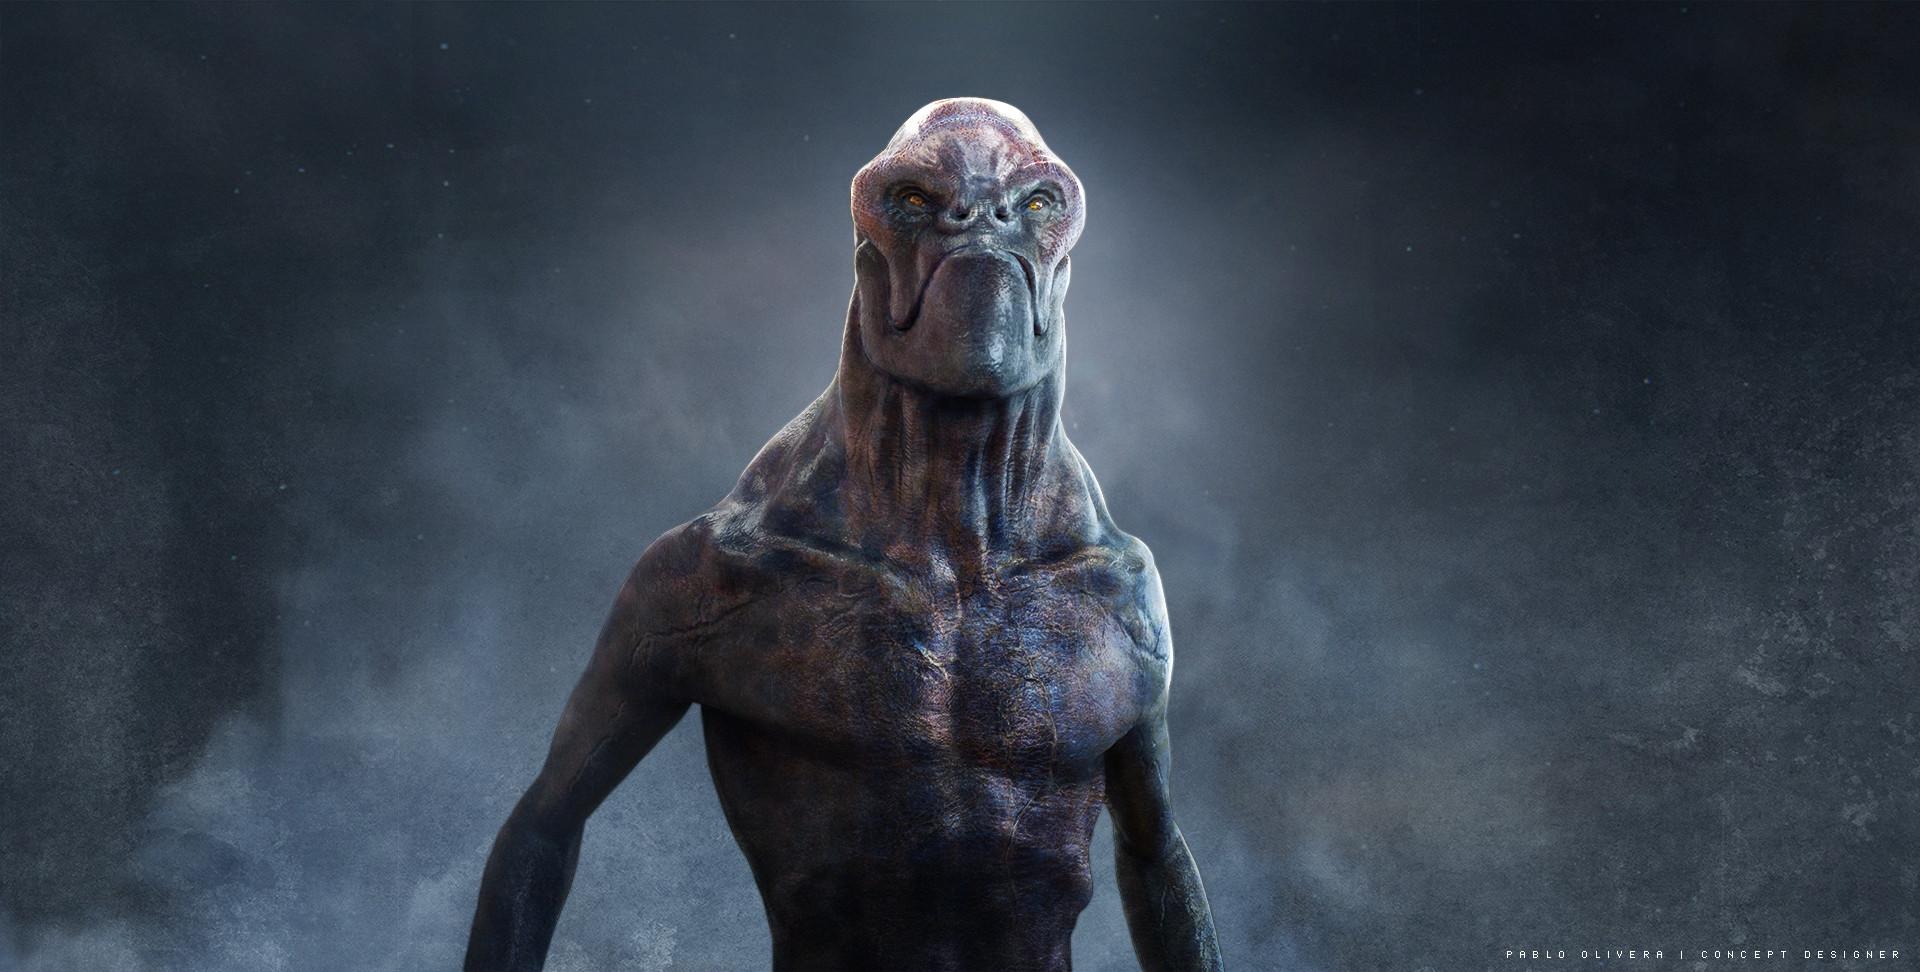 Pablo olivera alien character design by pablo olivera baja2